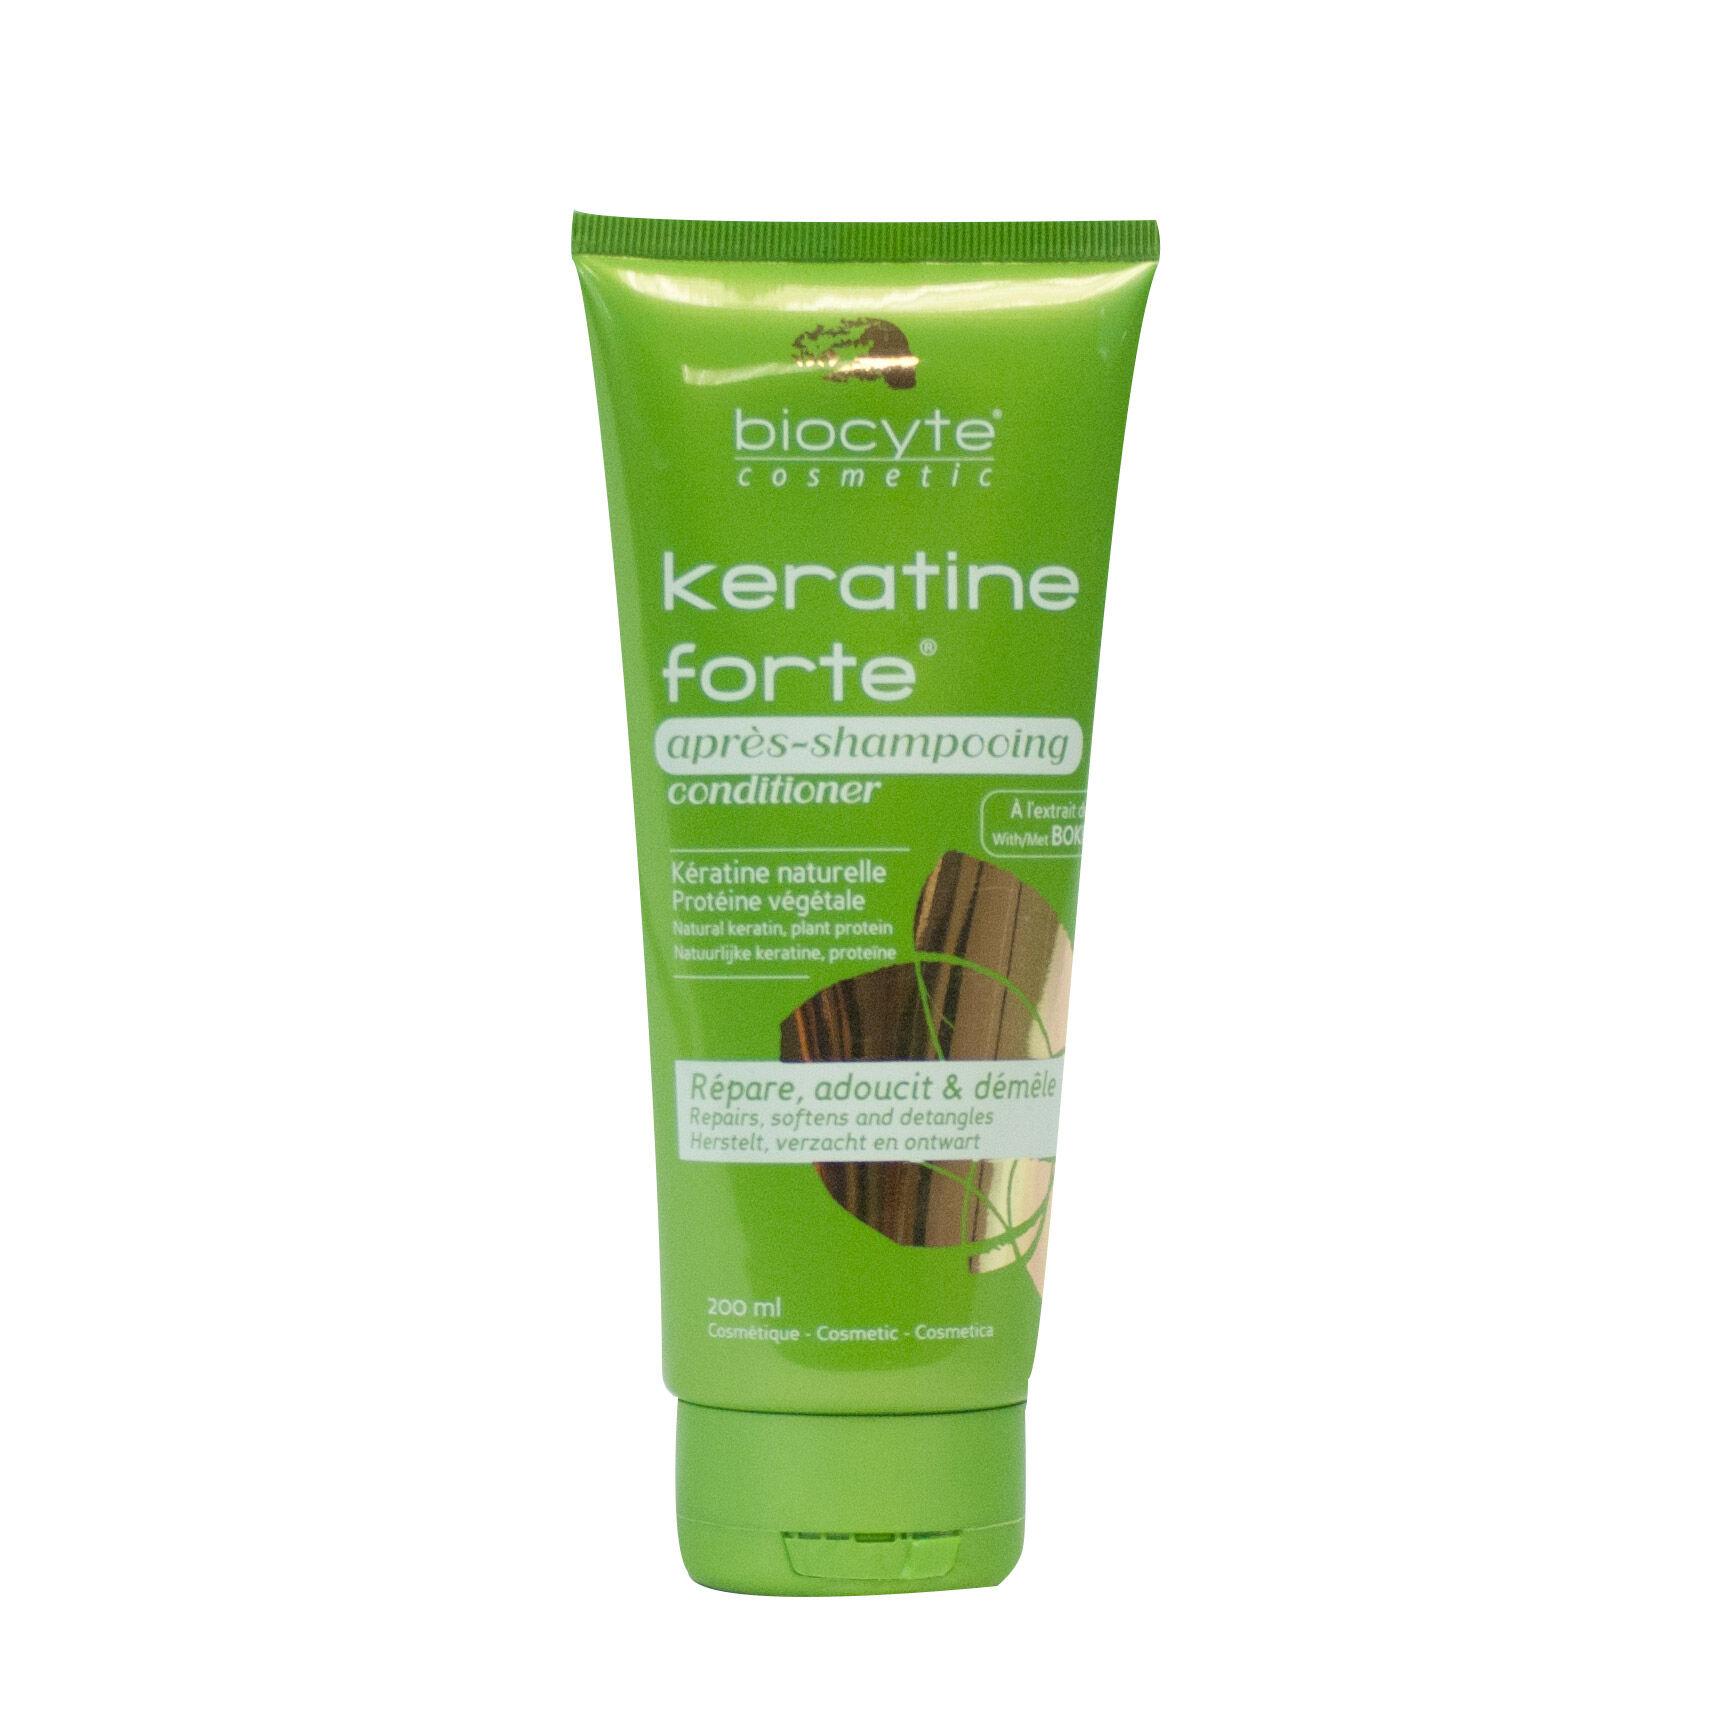 Biocyte Kératine Forte Après-Shampooing 200ml